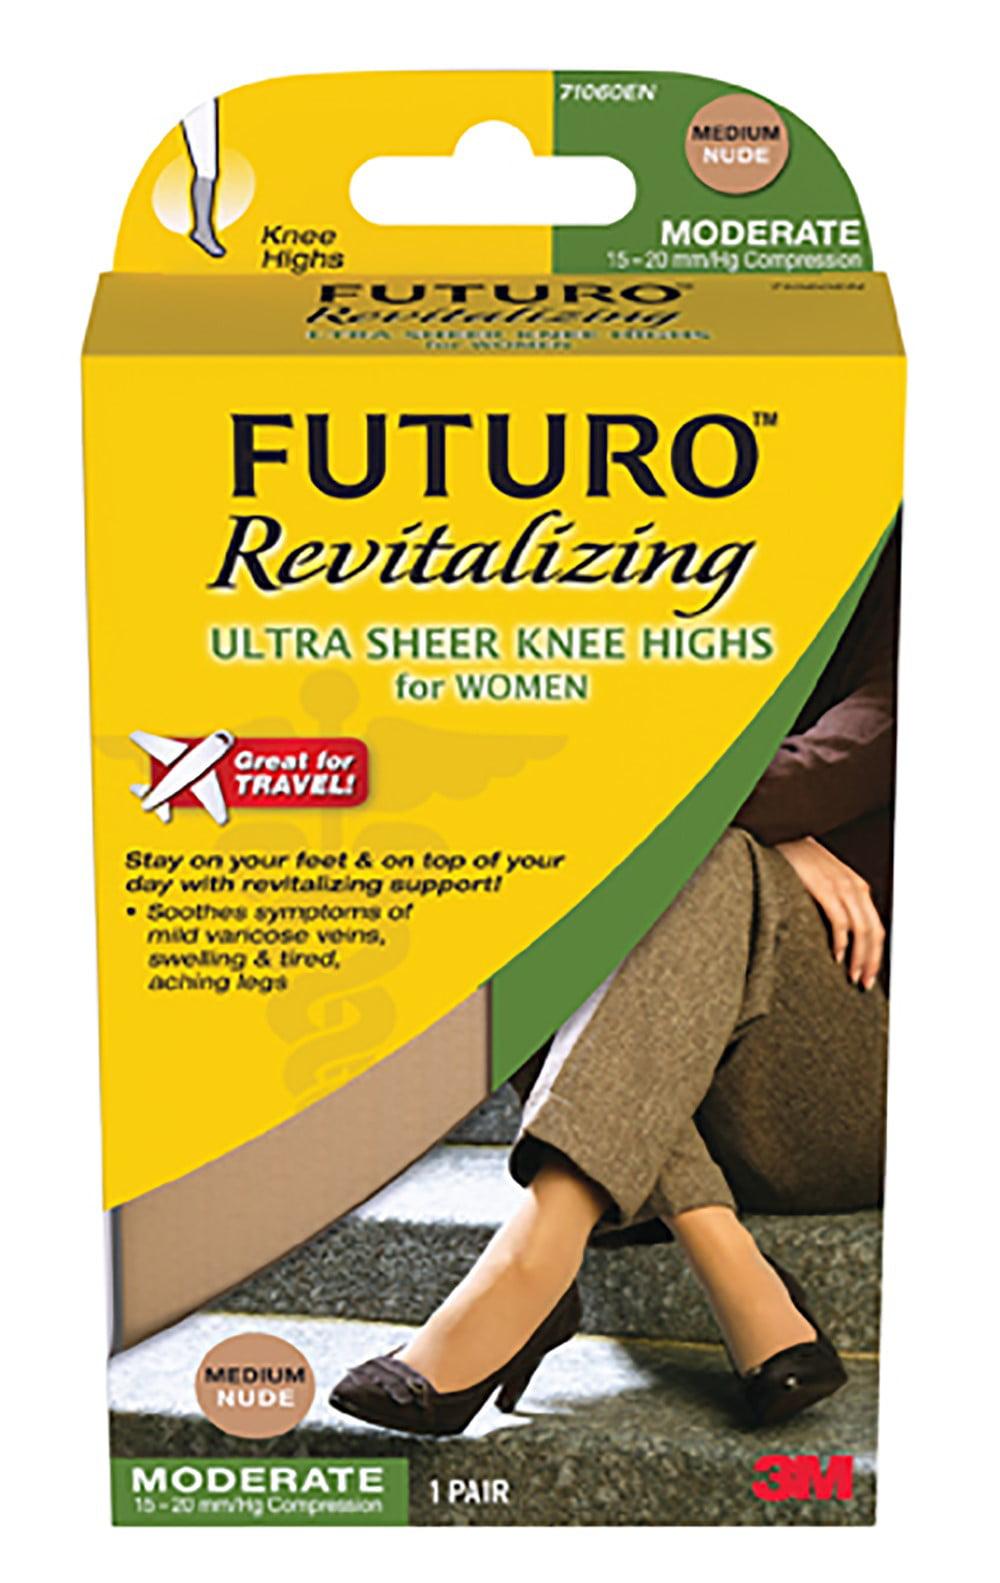 FUTURO Energizing Ultra Sheer Knee Highs for Women Mild